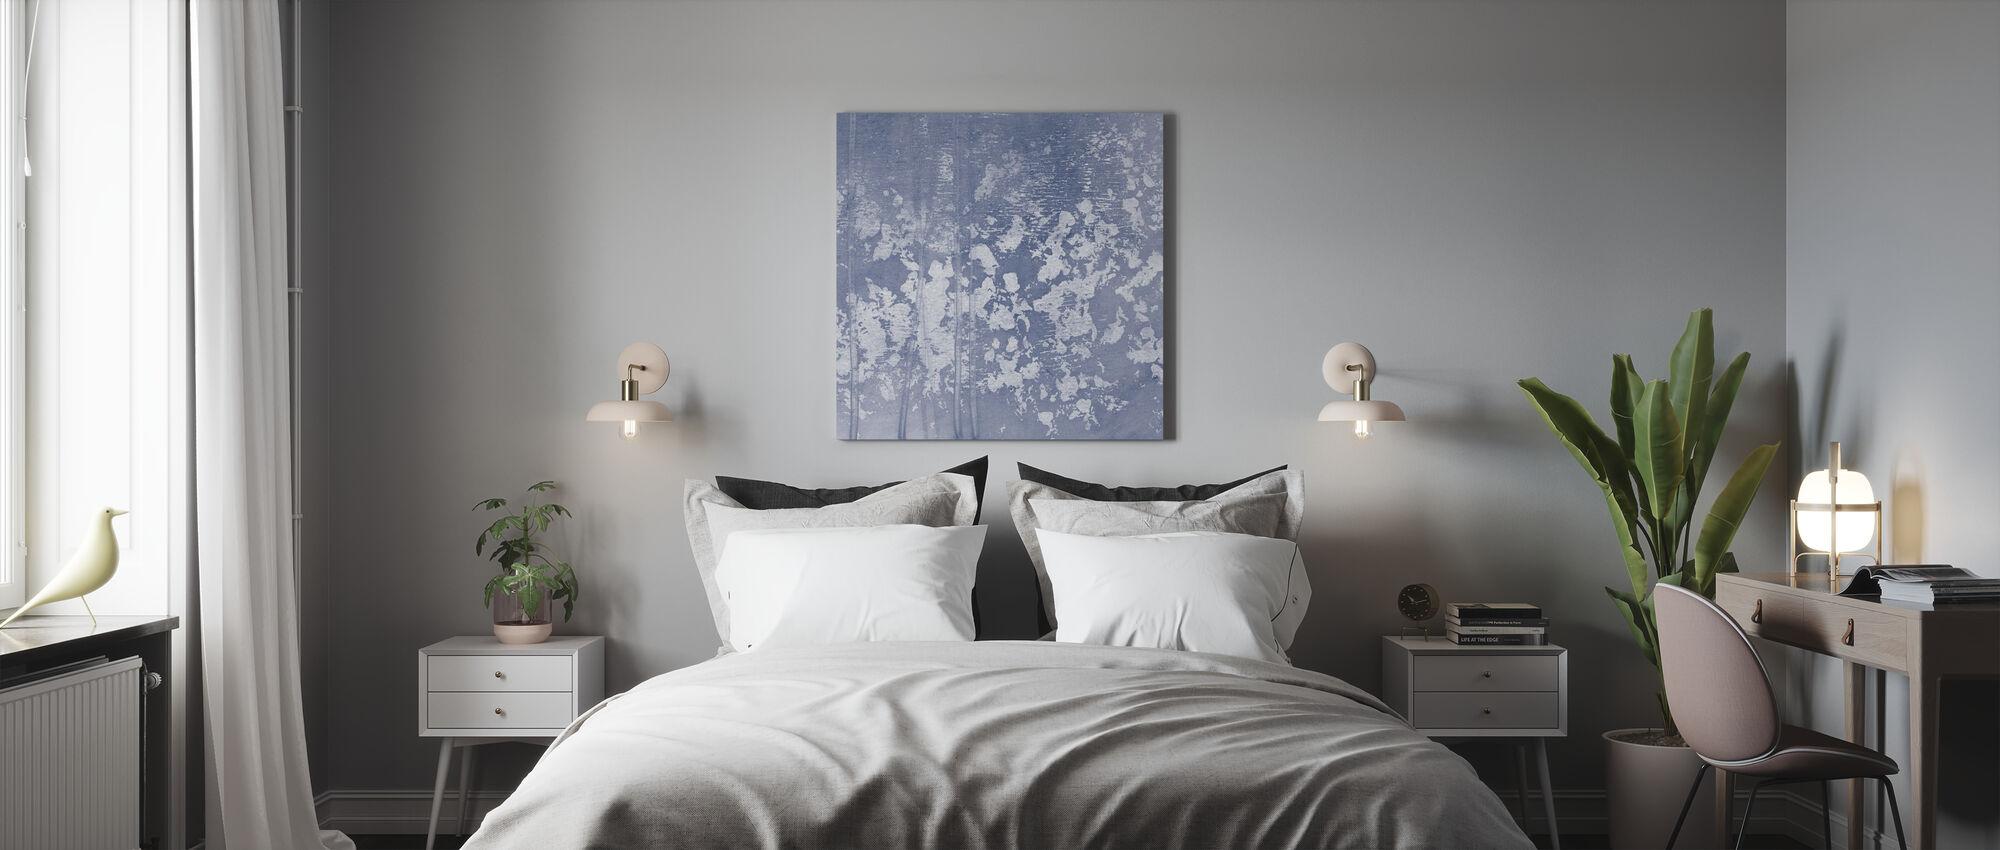 Indigo Regel - Leinwandbild - Schlafzimmer